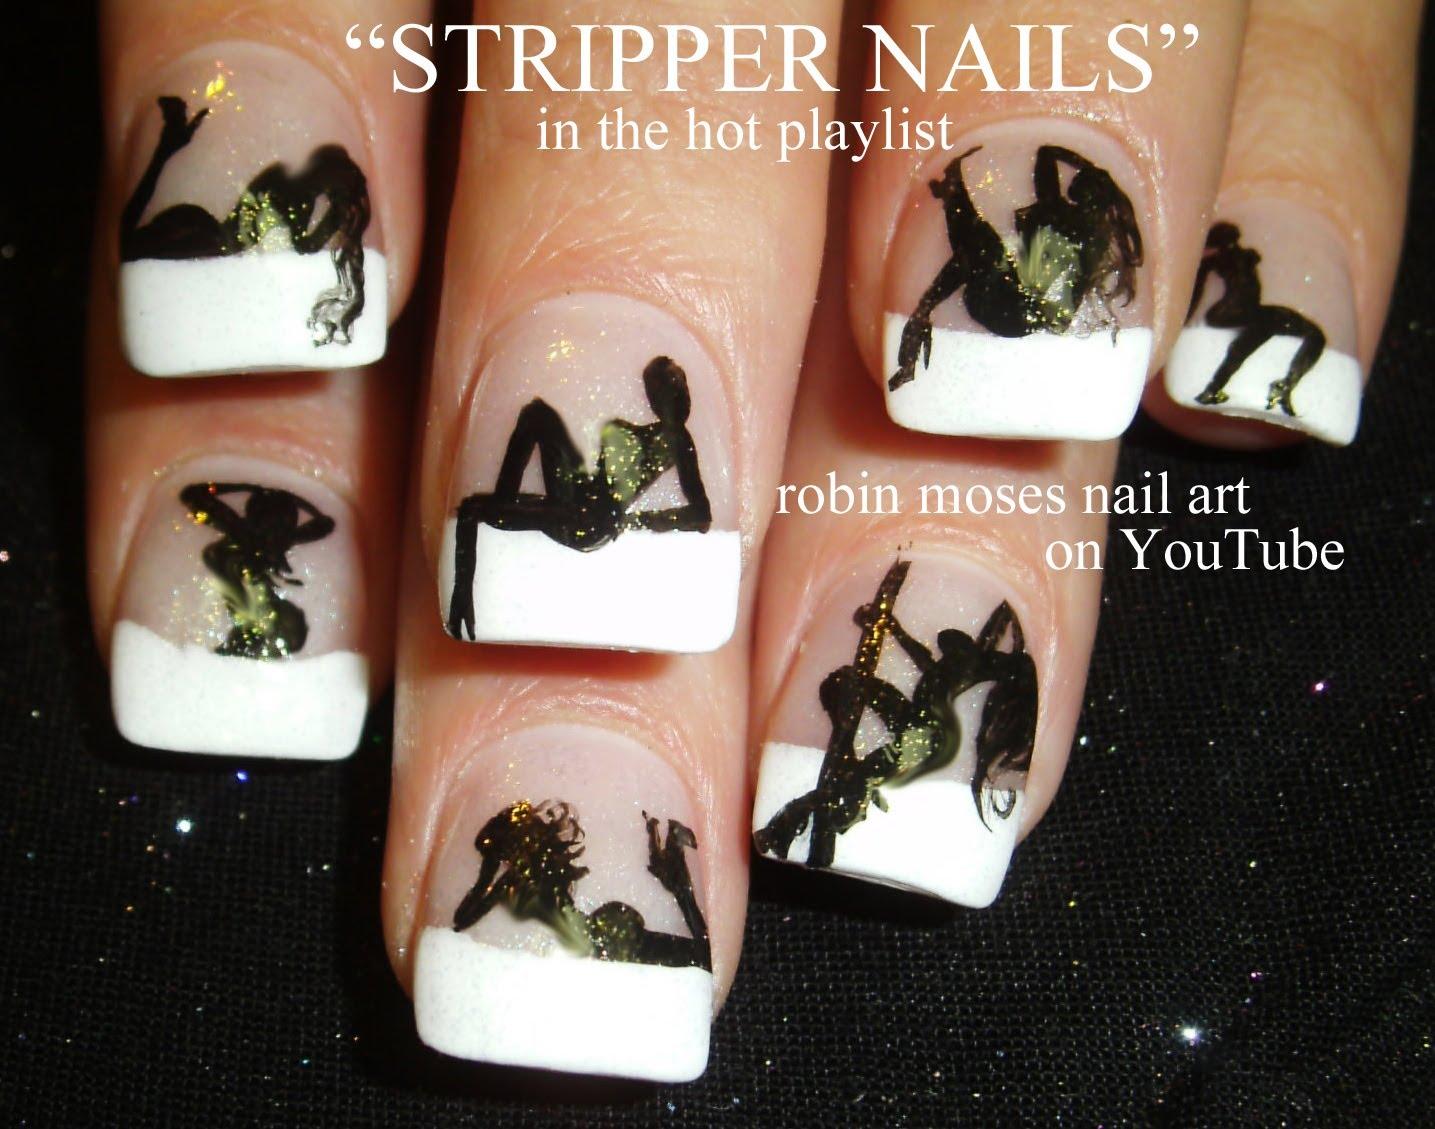 1435x1129 Hot Nails! Exotic Dancer Nail Art Design Stripper Nails Tutorial